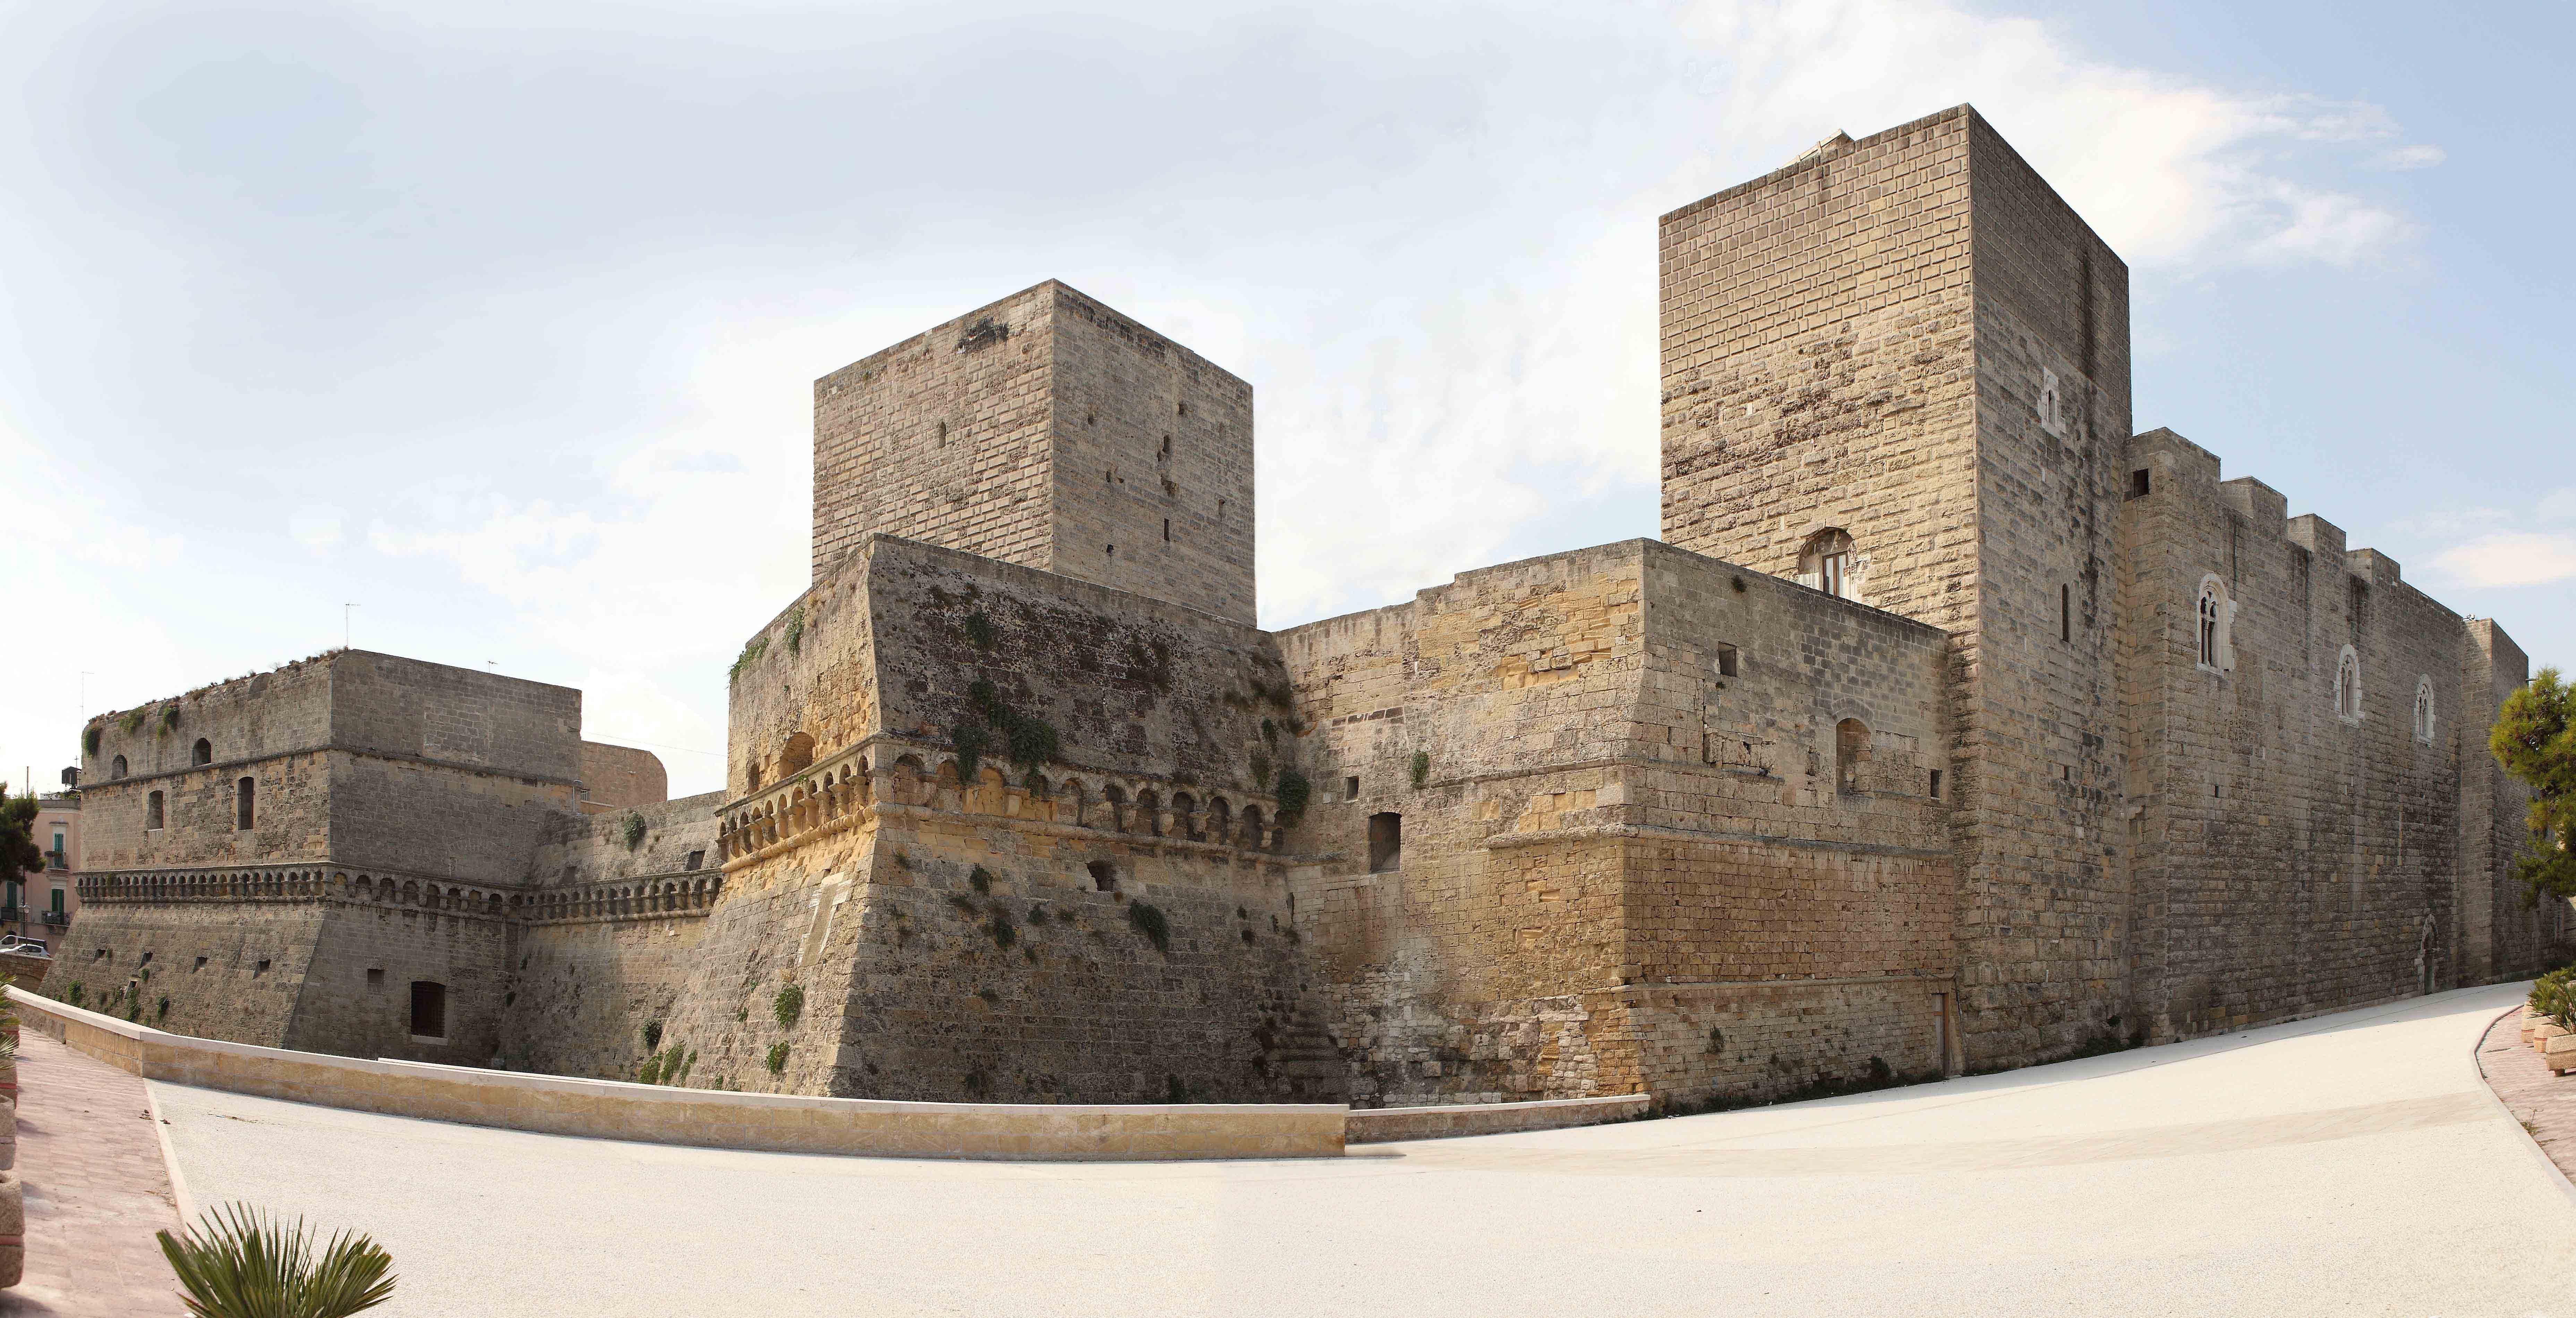 panorama_castello_svevo_ba_foto_beppe_gernone